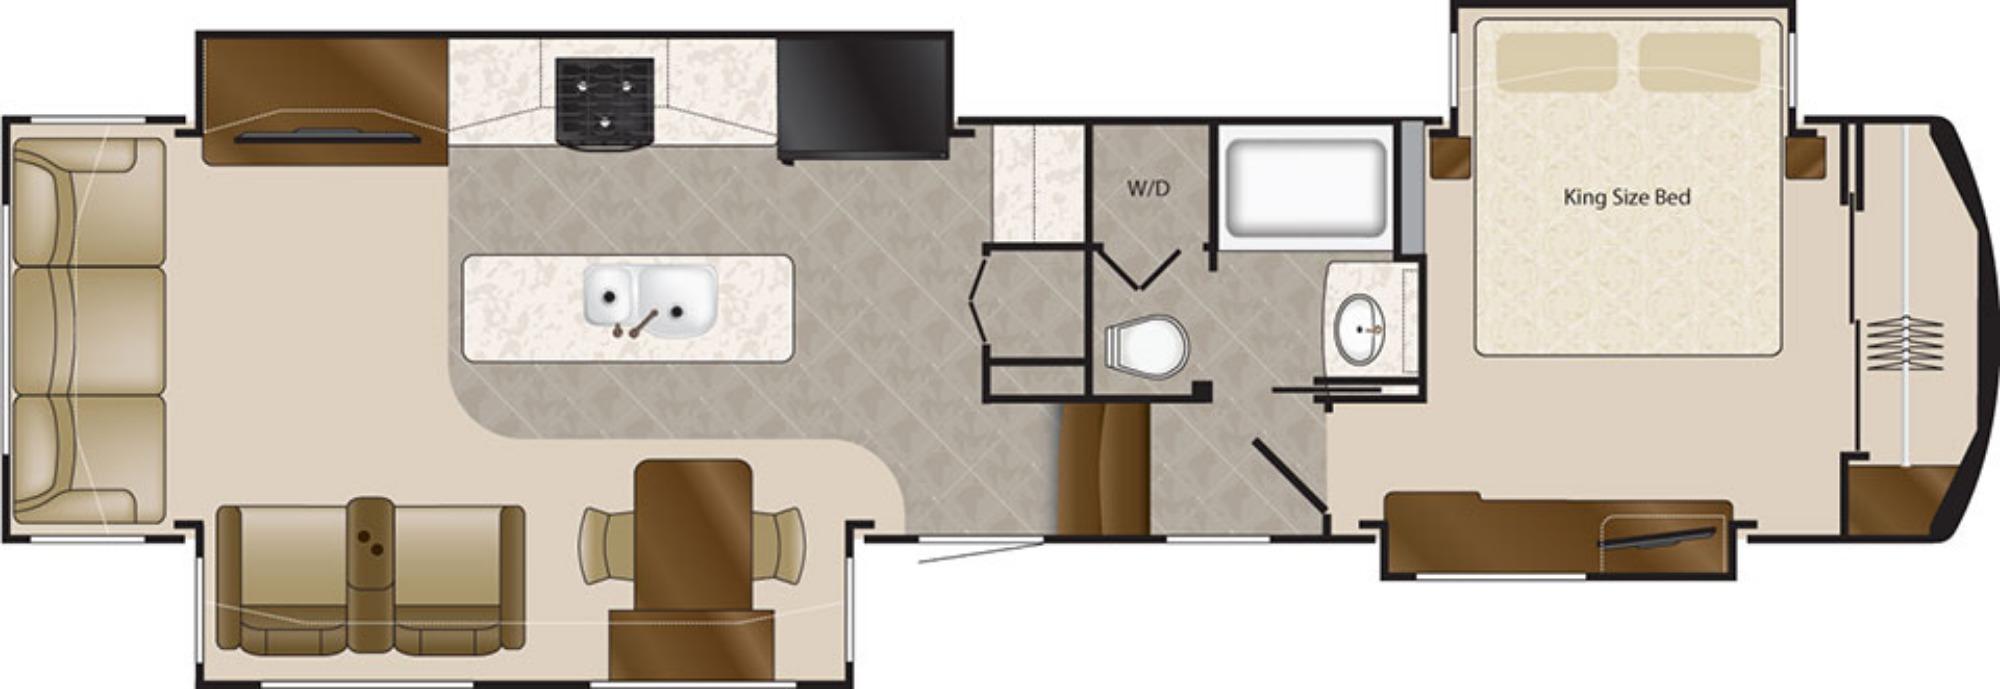 Bedroom : 2019-DRV LUXURY SUITES-38RSSA